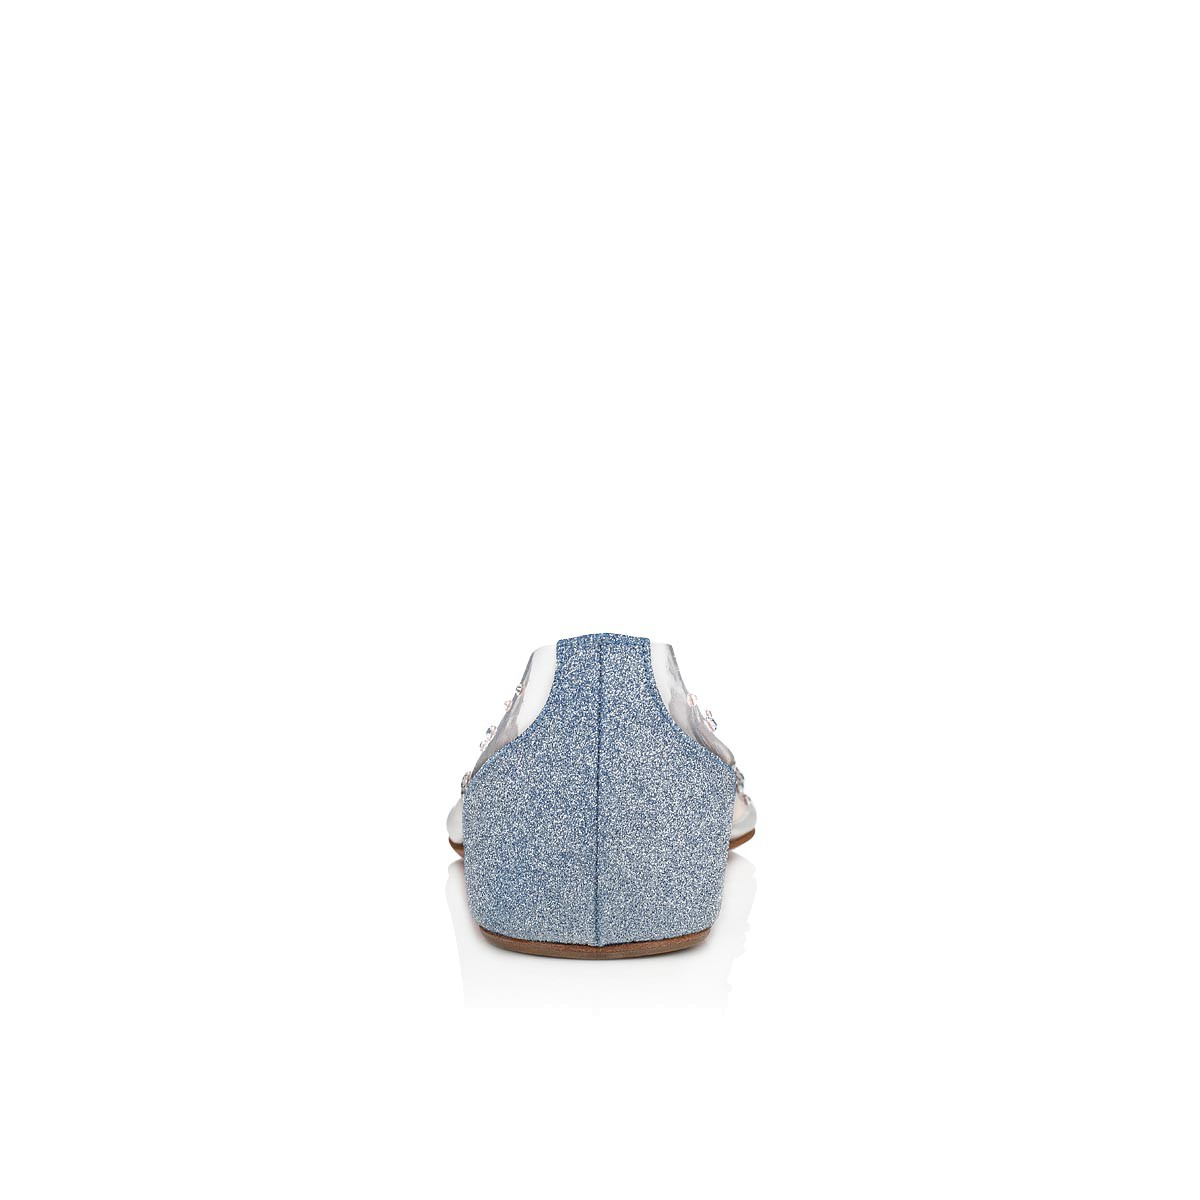 Shoes - Degrastrass Flat - Christian Louboutin